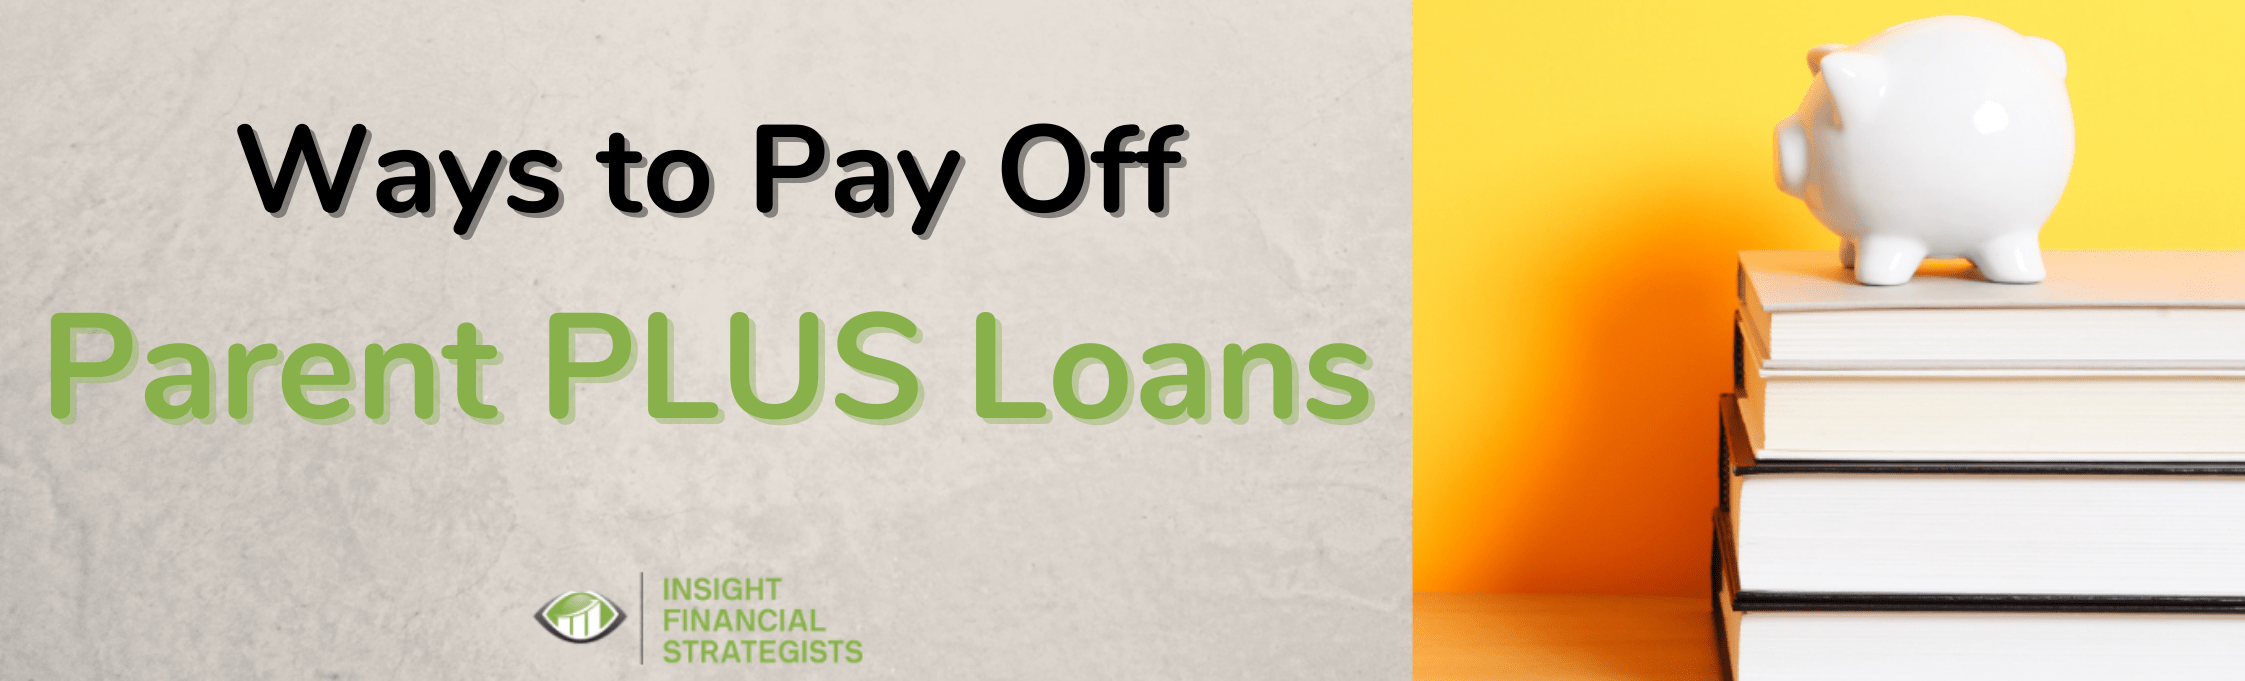 Ways to pay off Parent PLUS loans